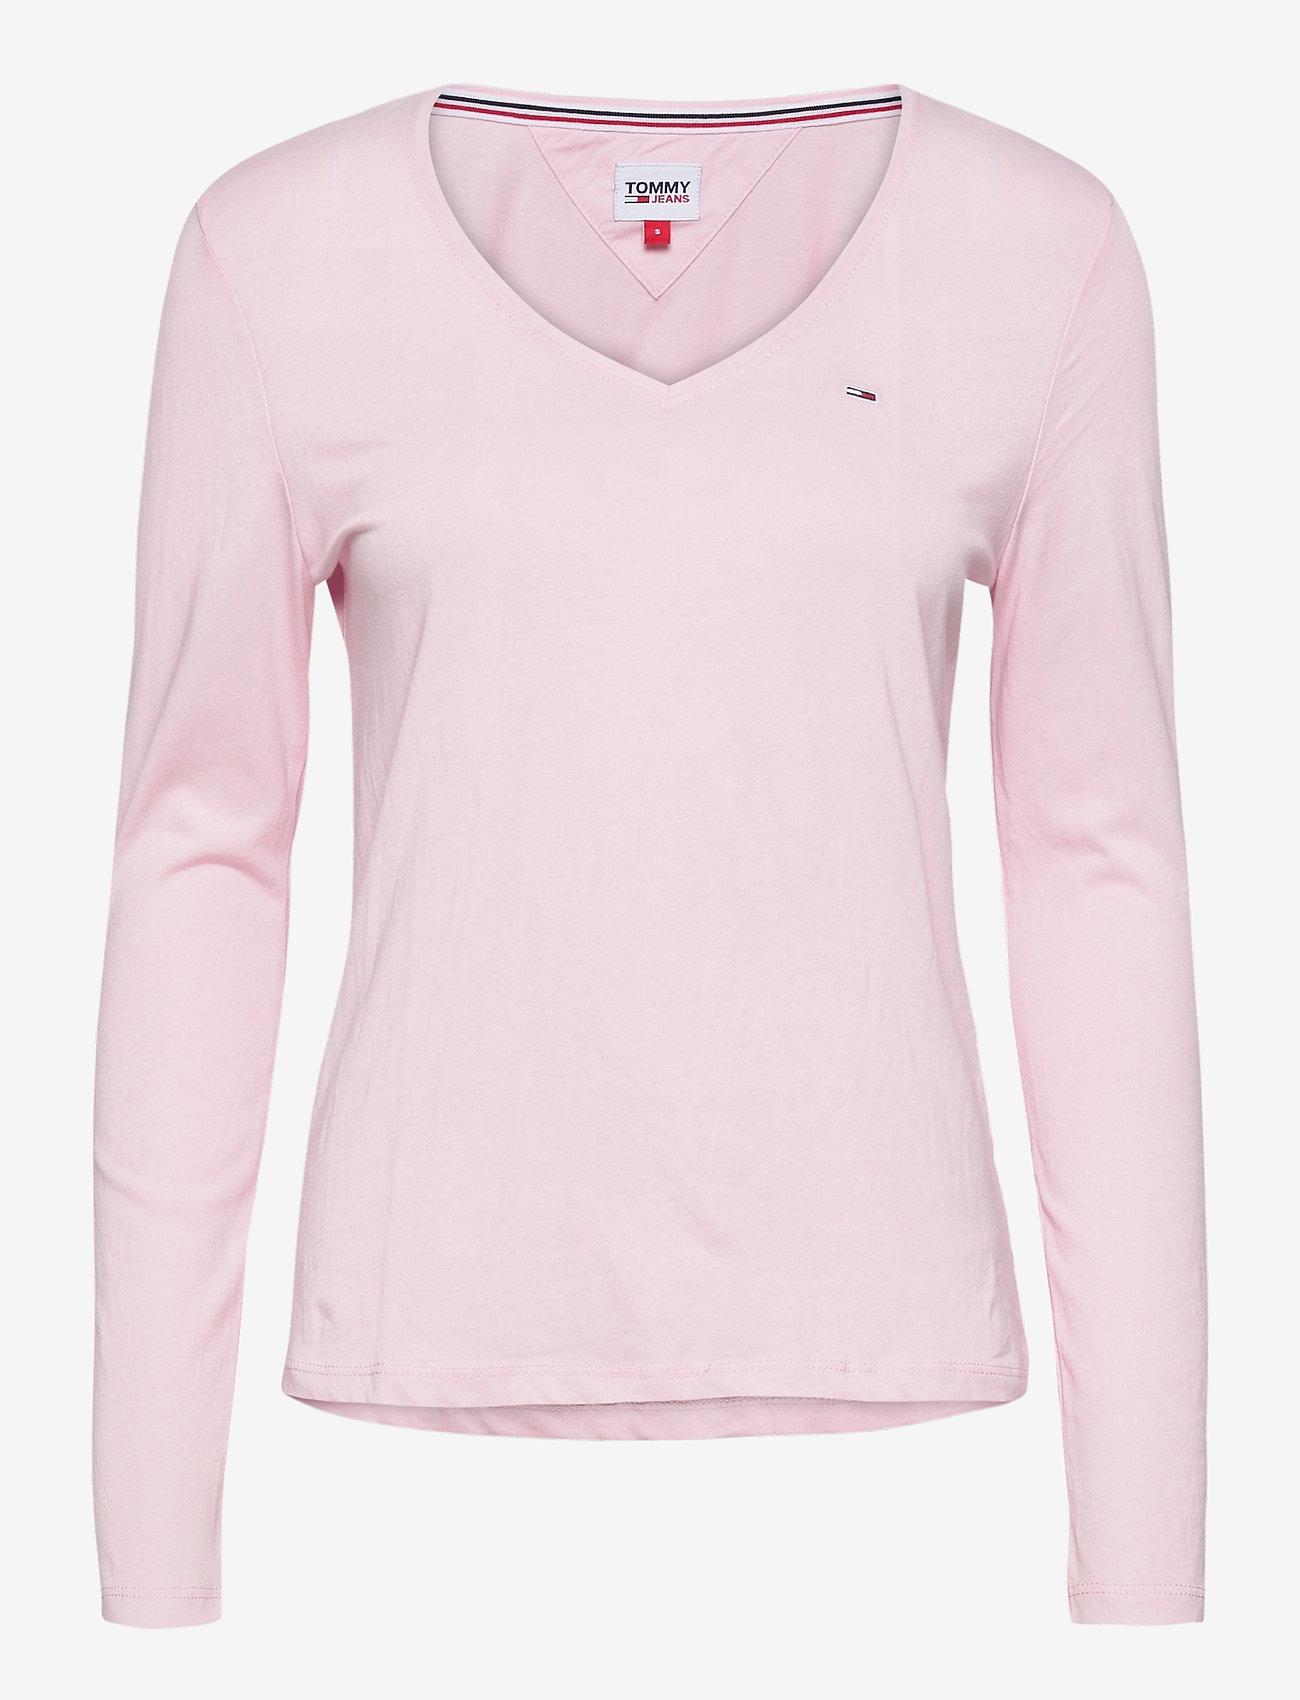 Tommy Jeans - TJW JERSEY V NECK LONGSLEEVE - long-sleeved tops - romantic pink - 0